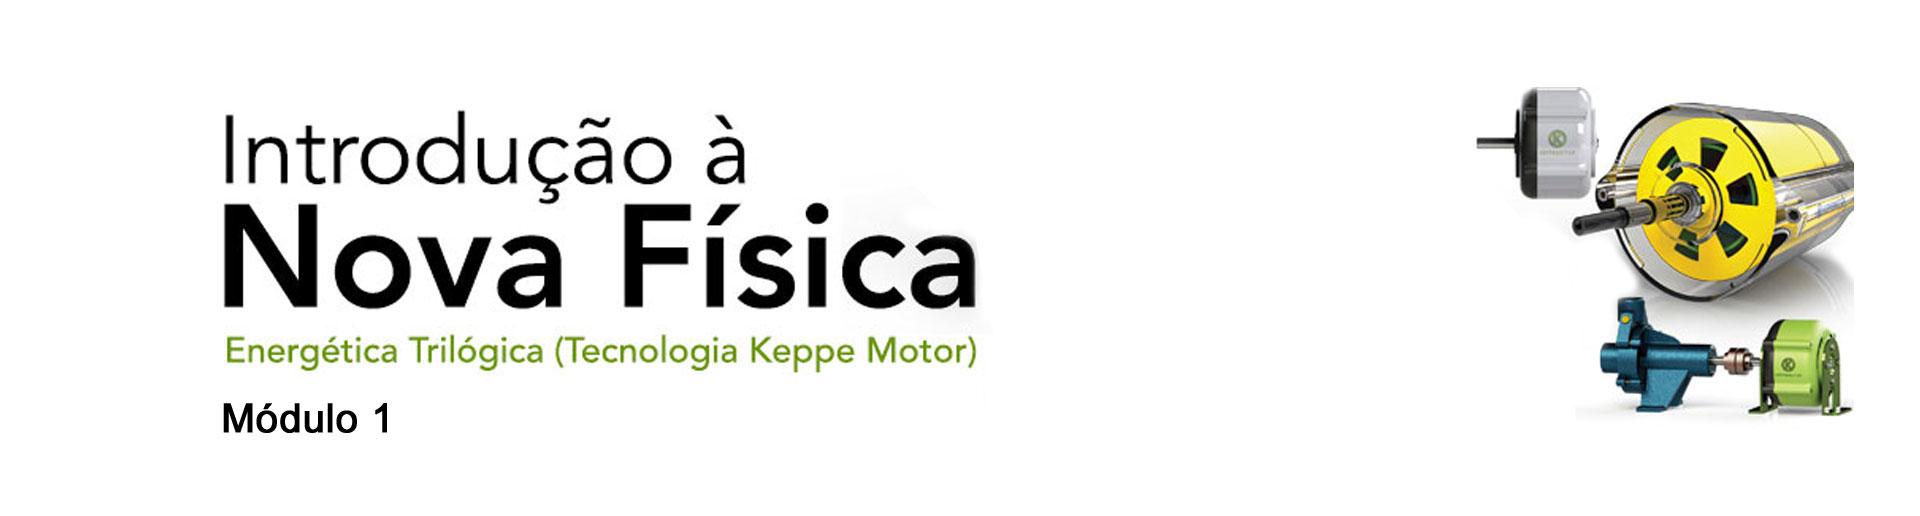 banner-site-curso-nova-fisica-2017